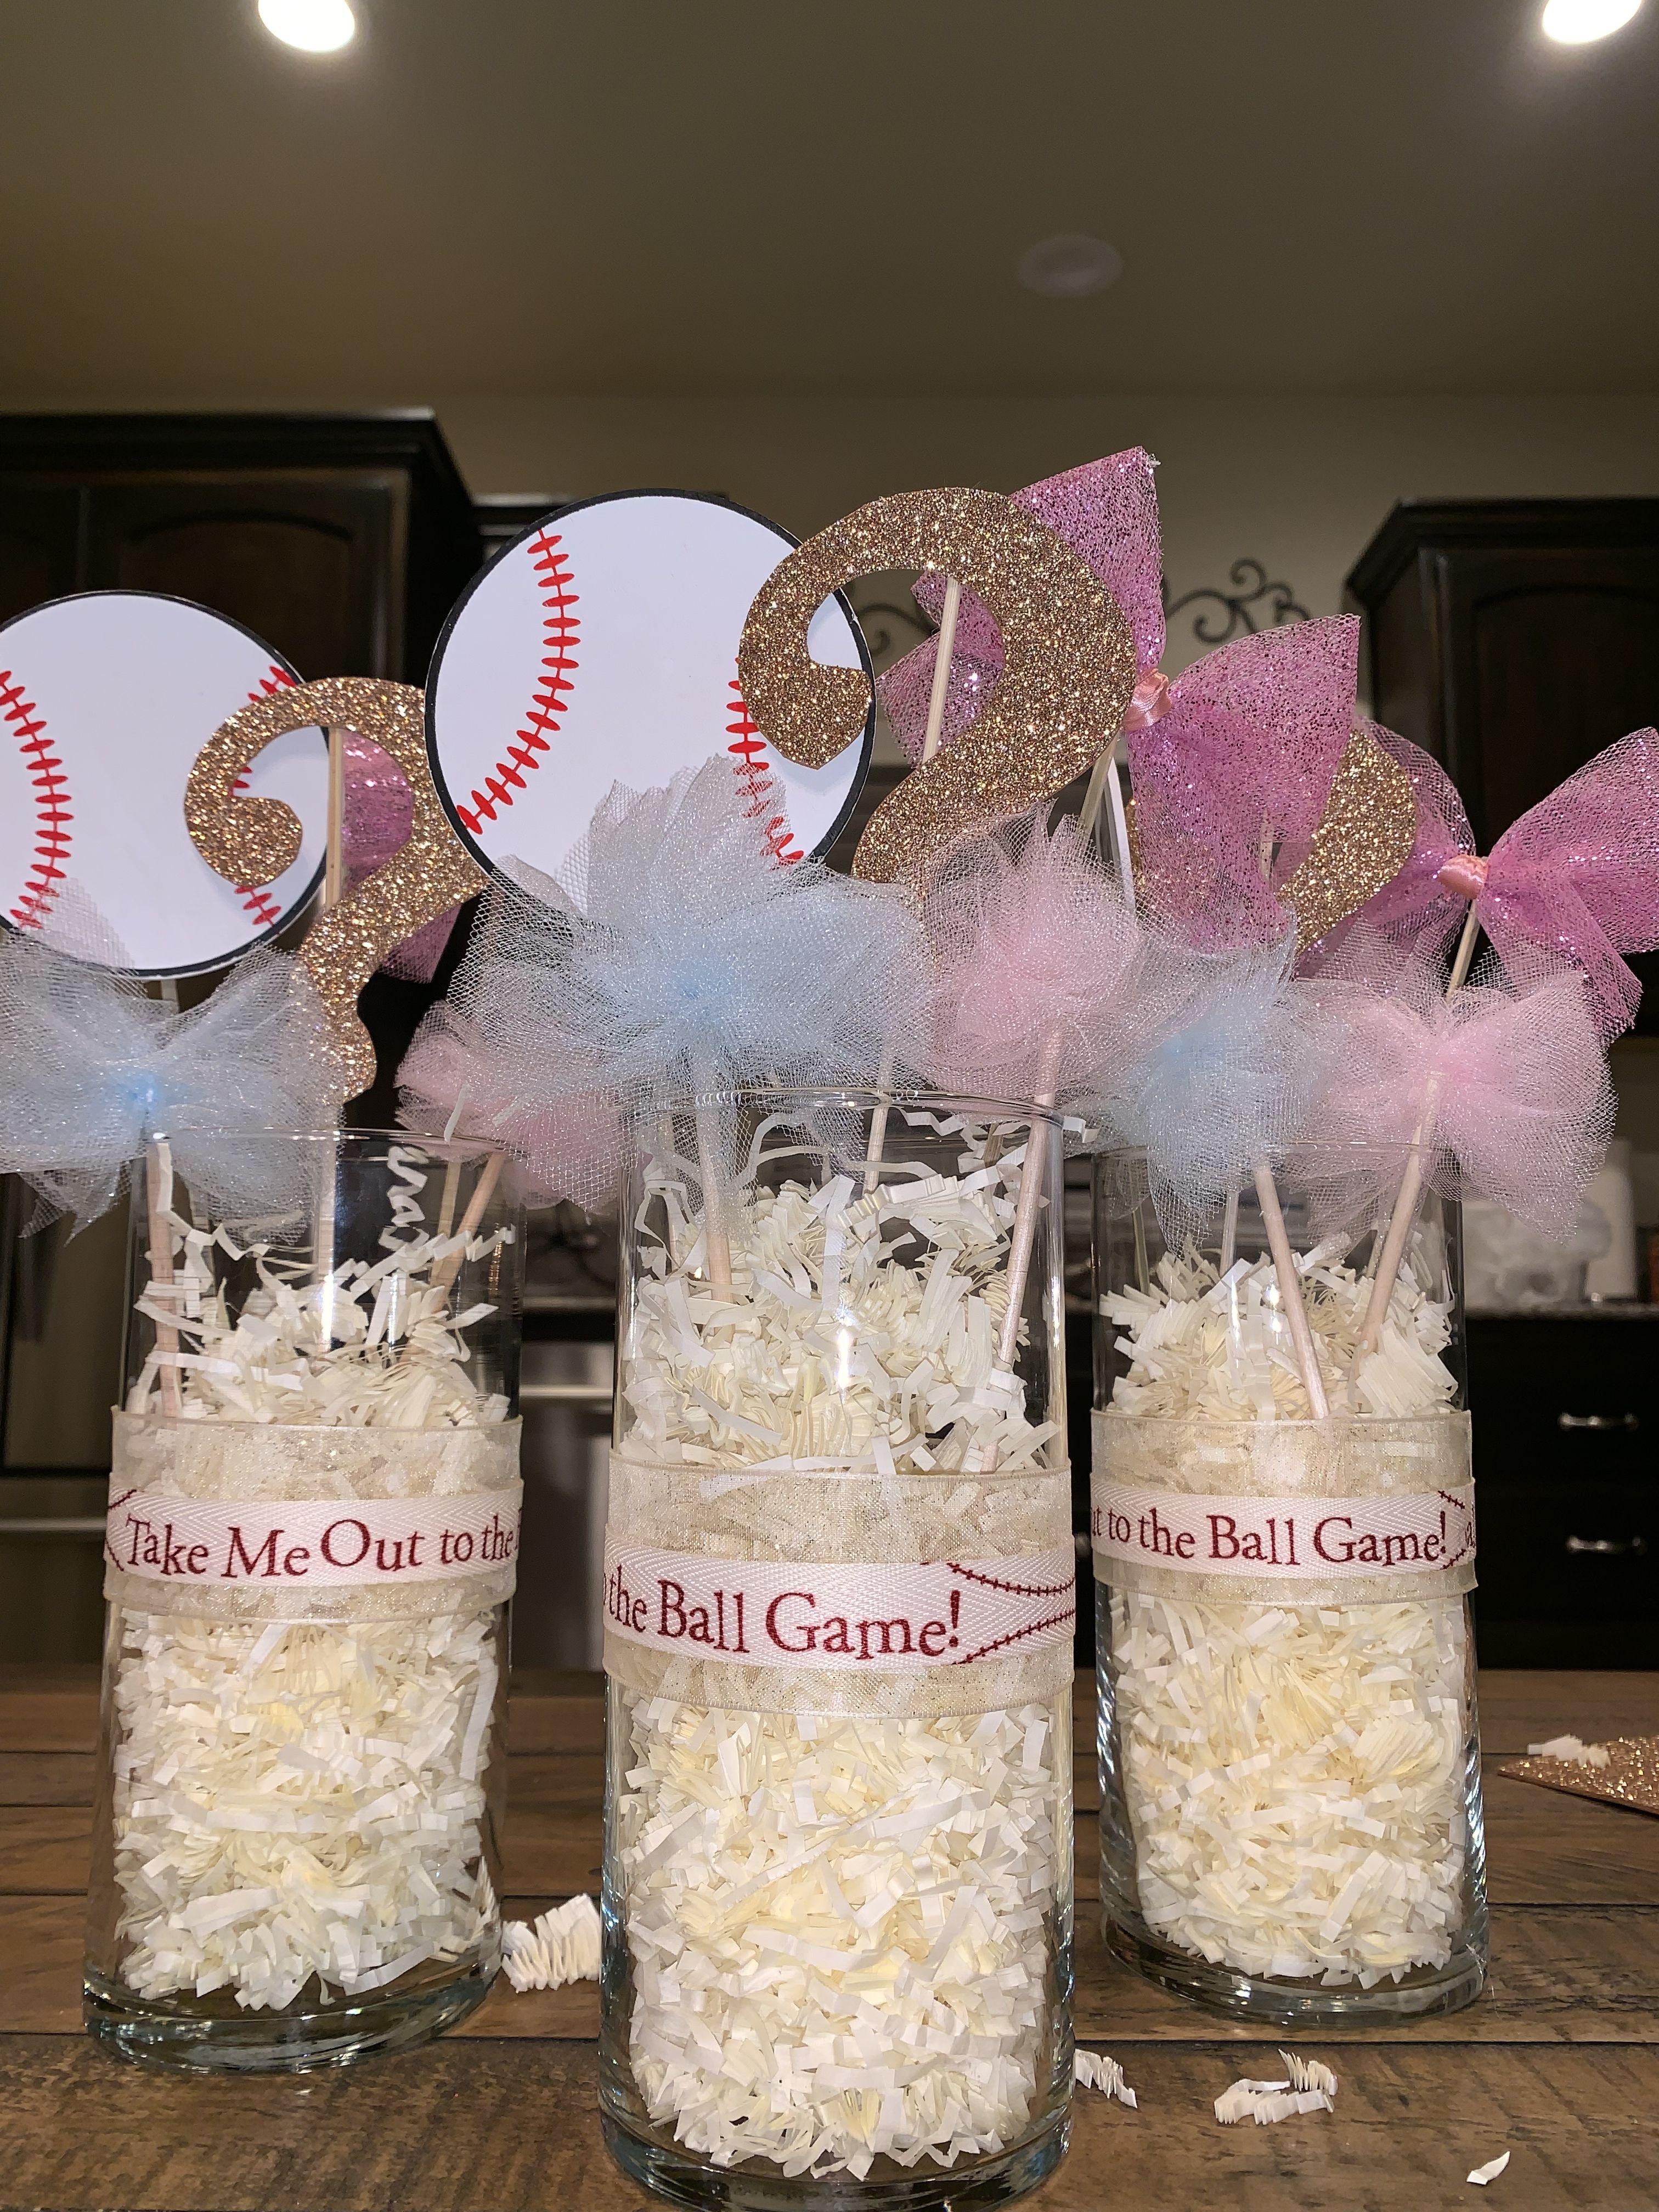 Baseballs Or Bows Center Piece For Gender Reveal Gender Reveal Party Decorations Gender Reveal Themes Baby Gender Reveal Party